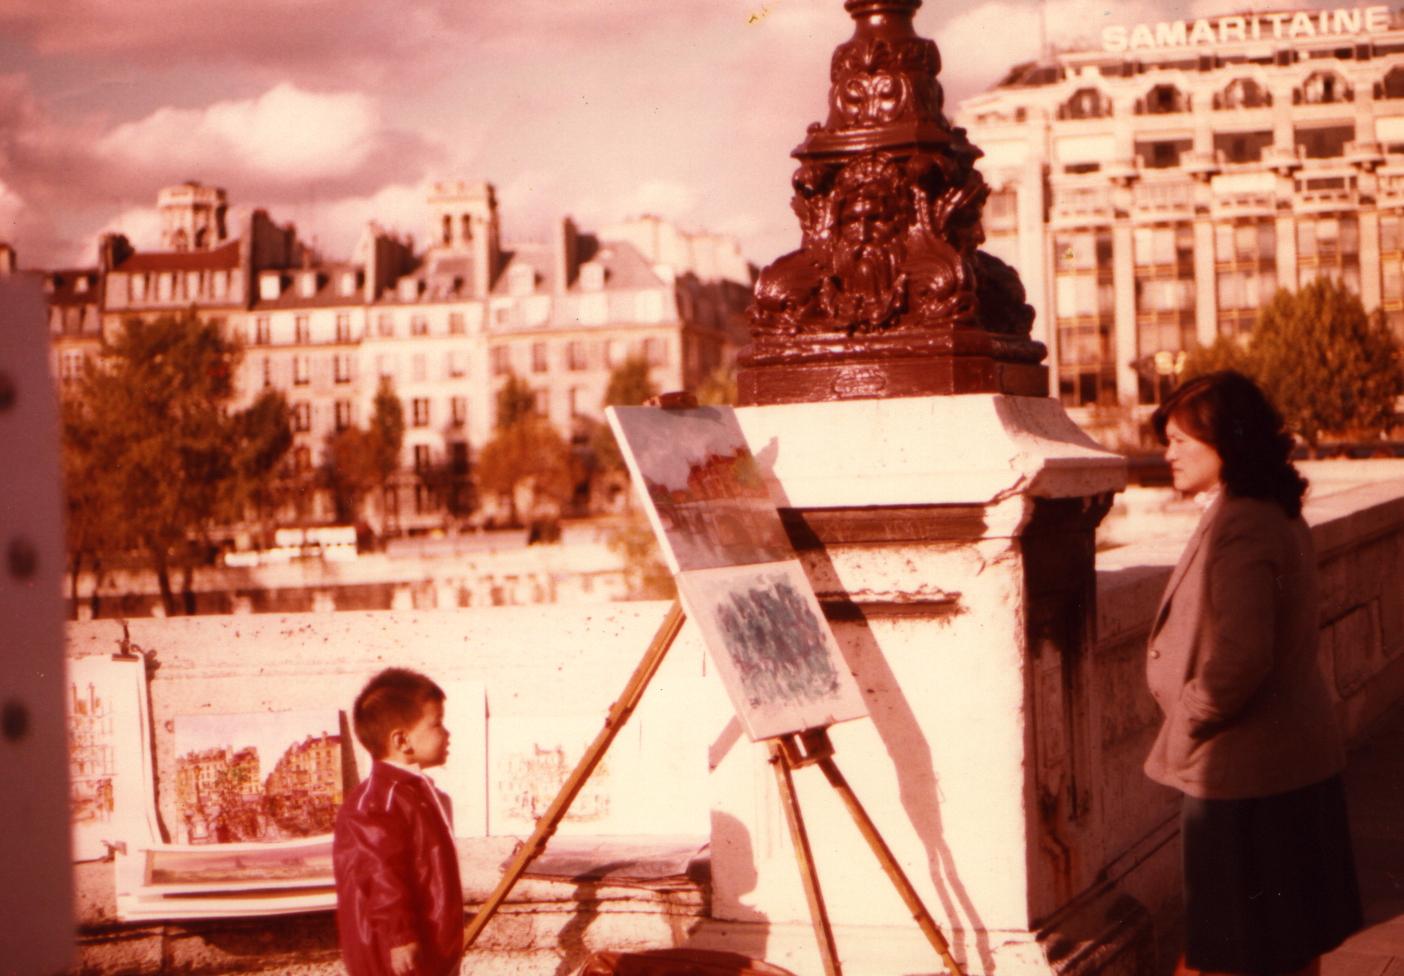 1982 08 12 010 Tam, Huong, Dang & Phuong tham Ba Ma 1982 (273)